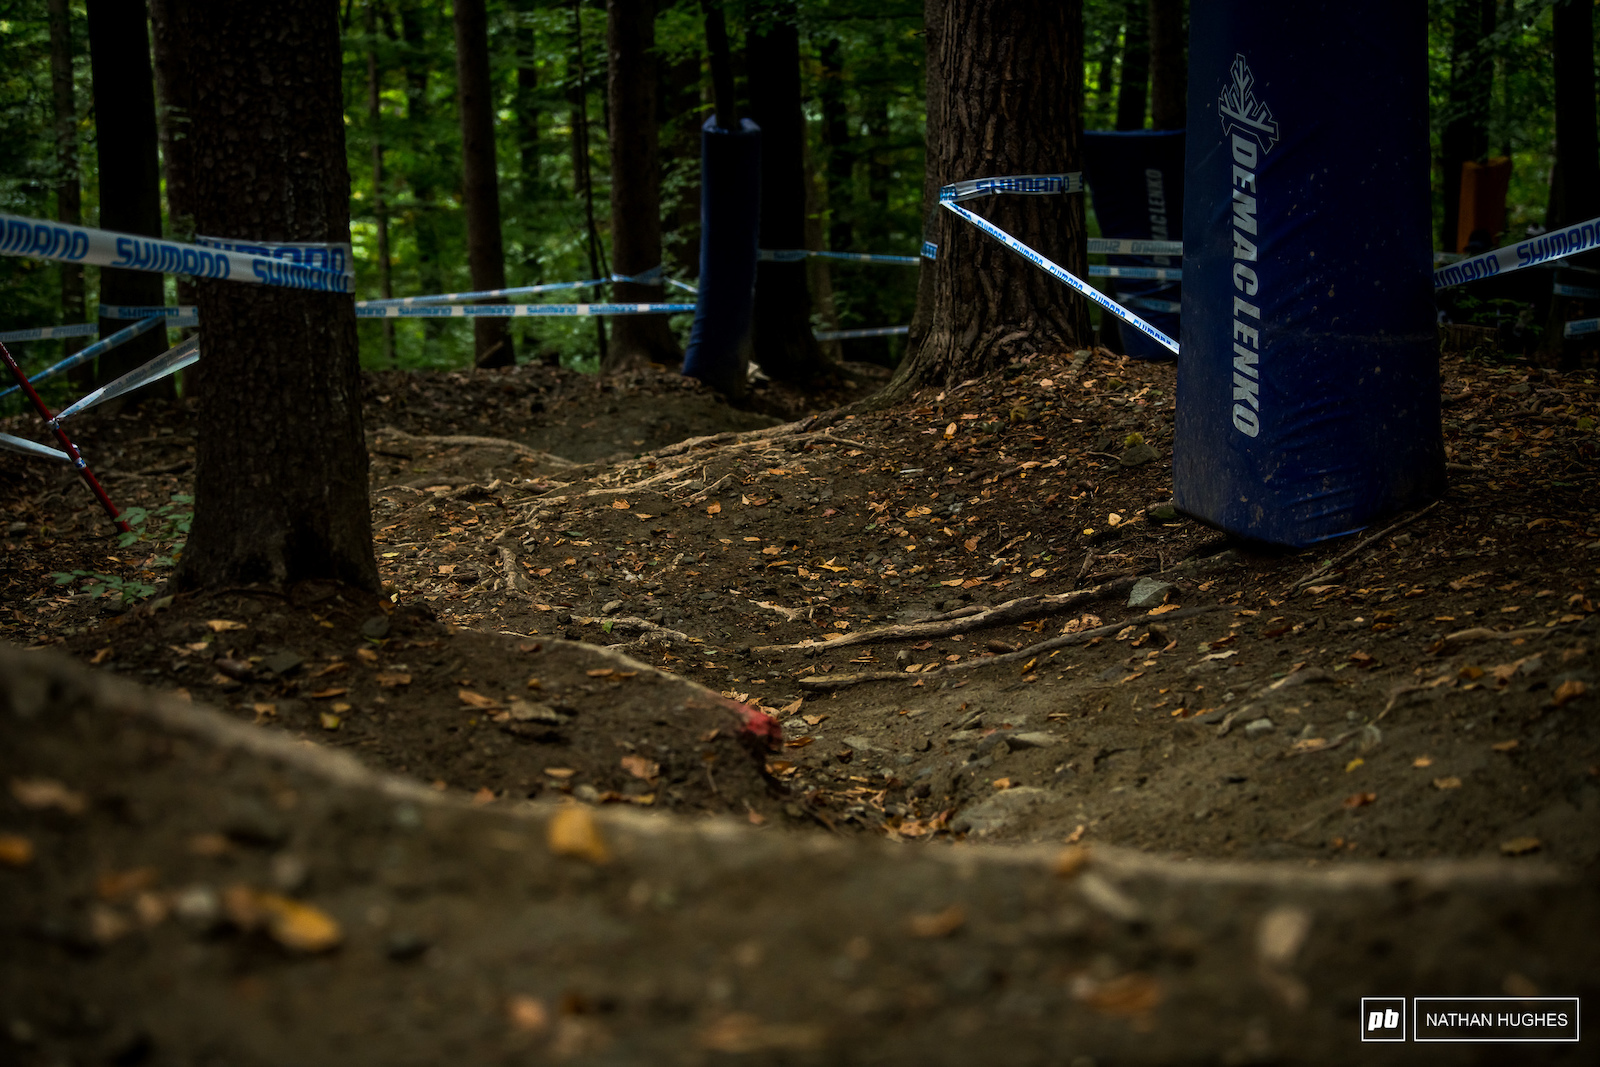 Maribor s main theme undulating smooth dirt with rooty interuptions.